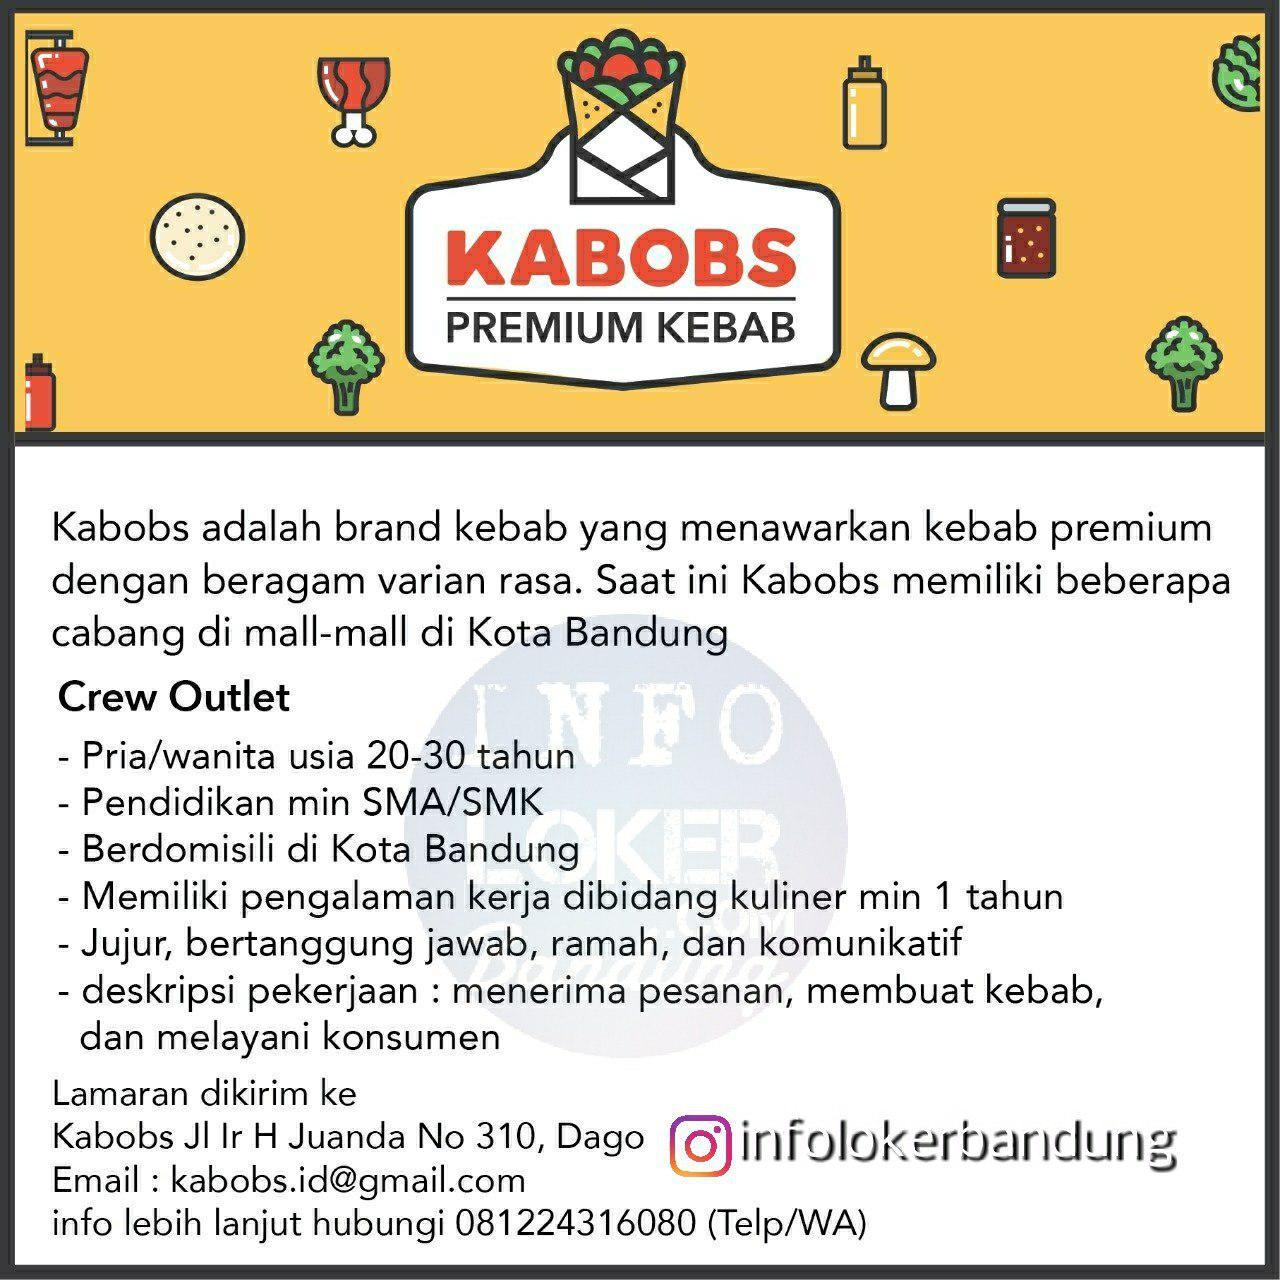 Lowongan Kerja Kabobs Bandung April 2018